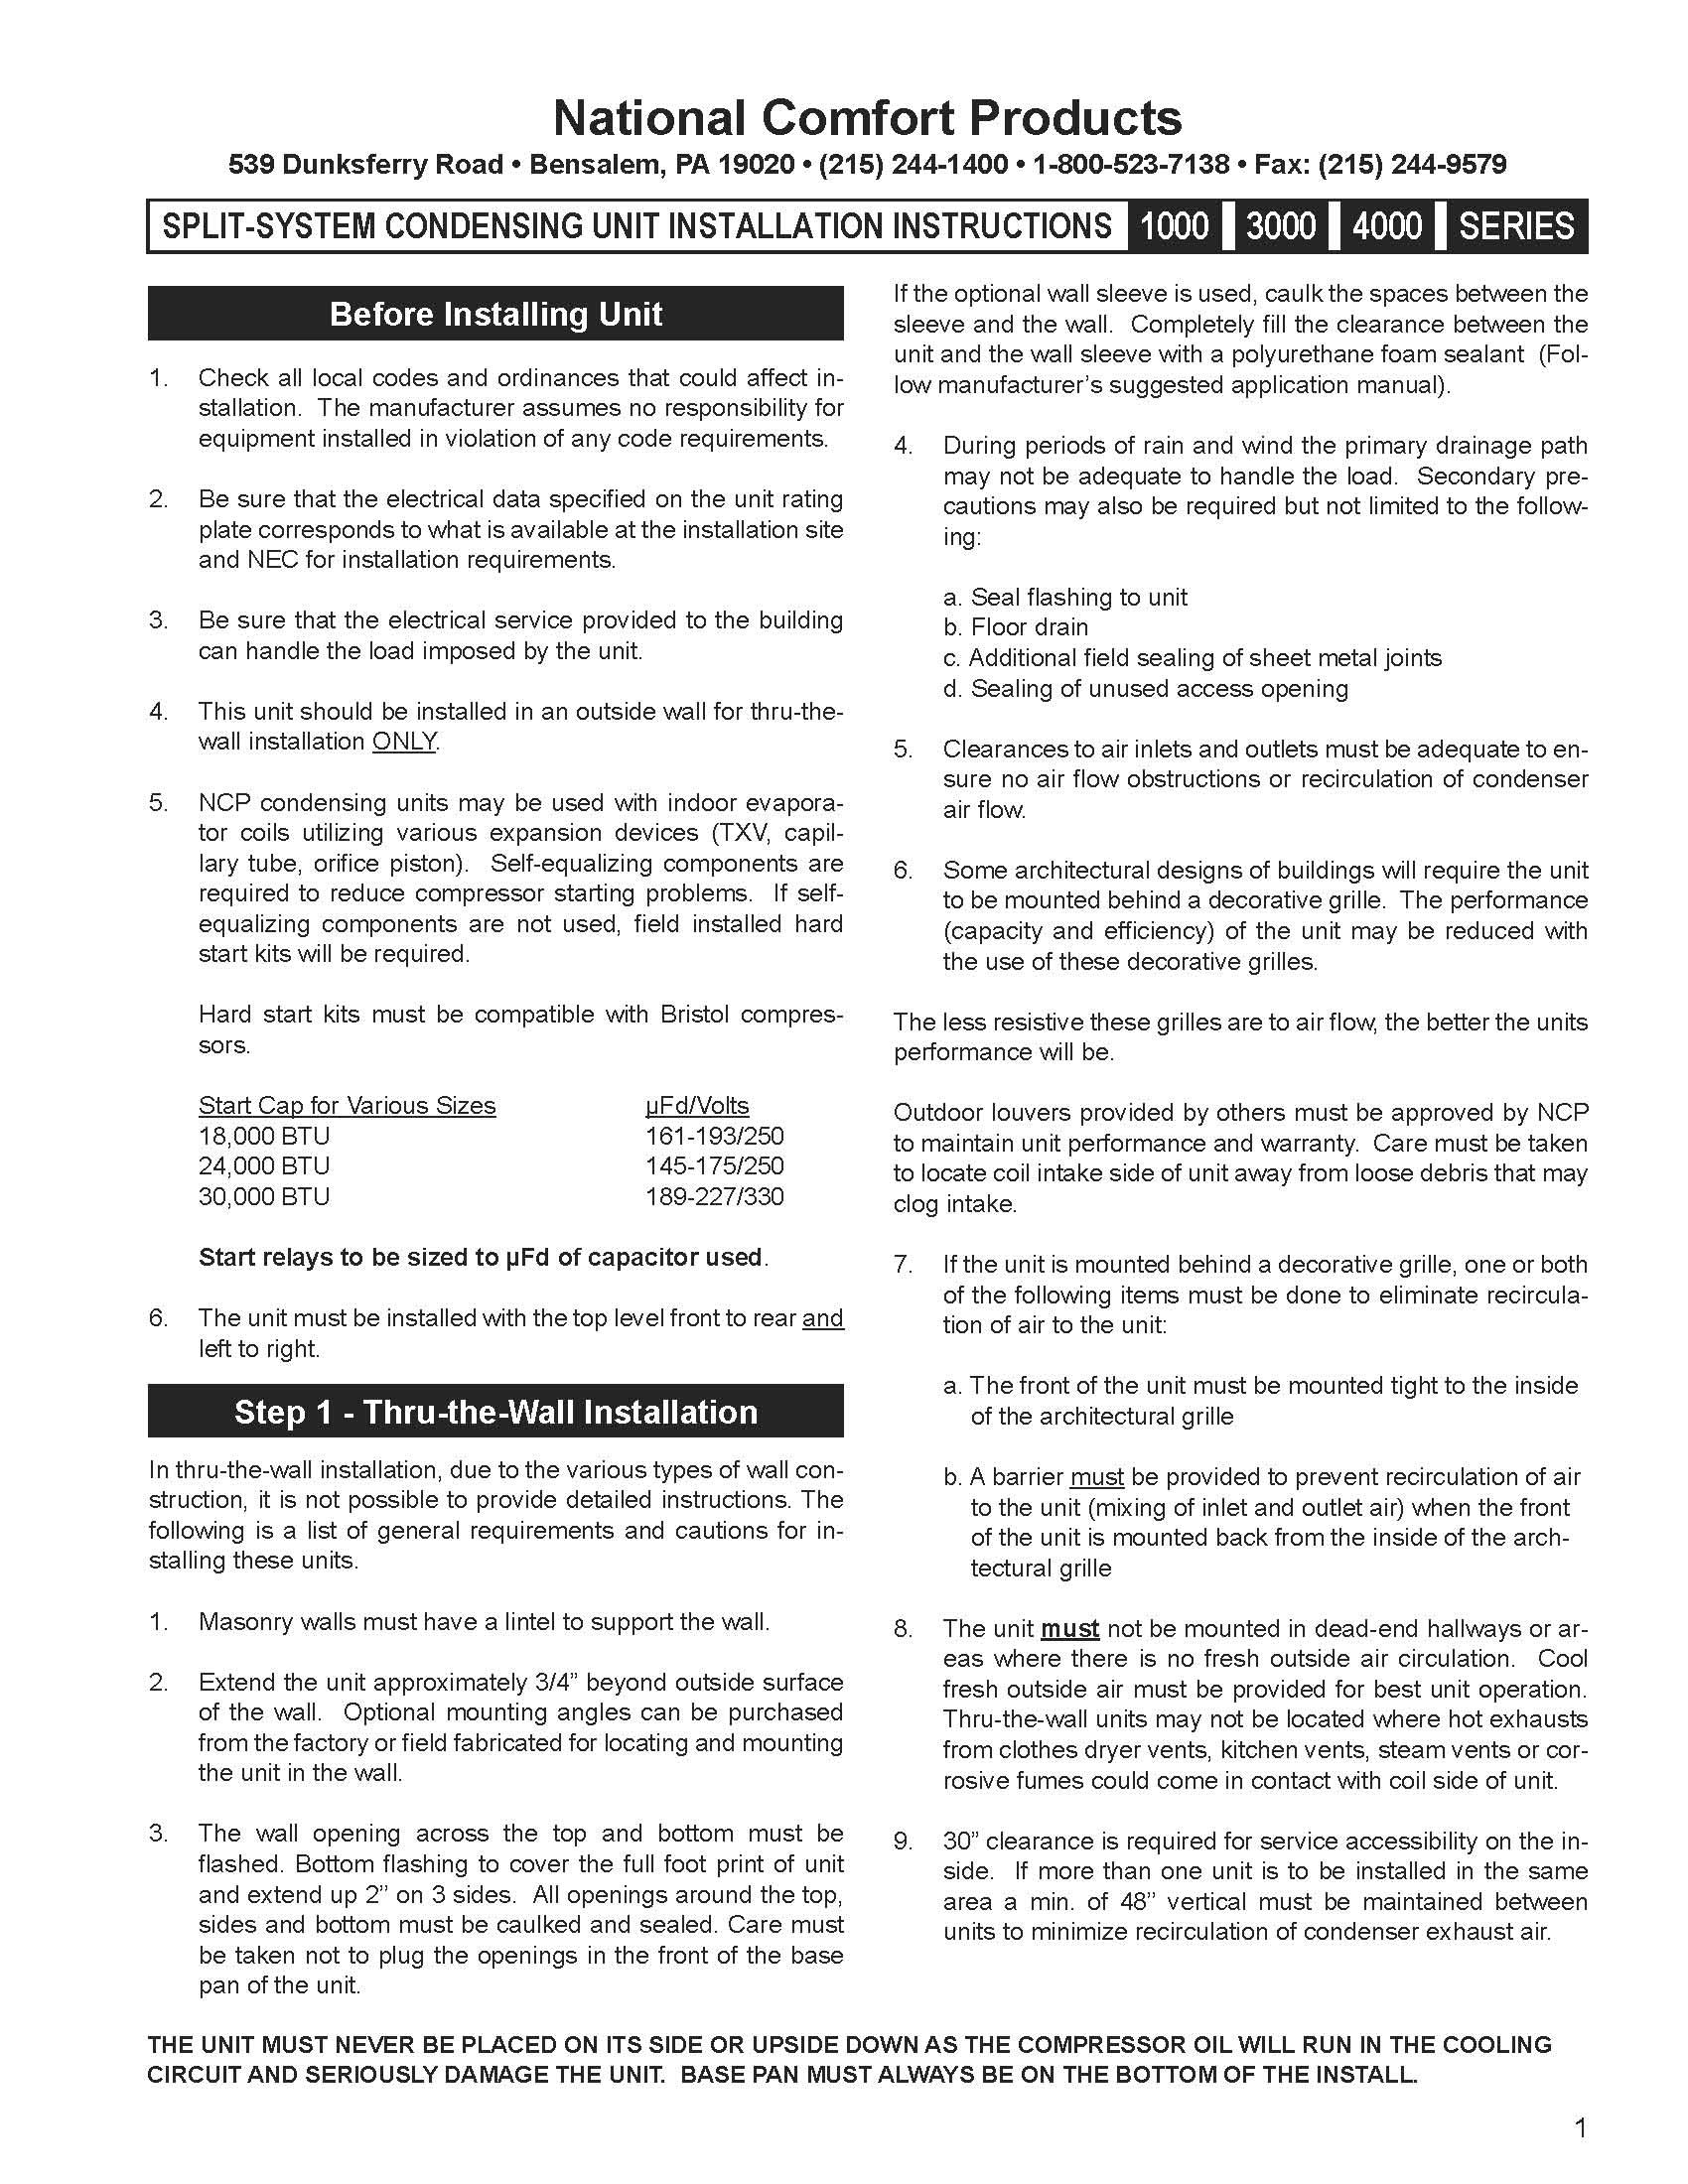 NCPC R22_Page_01.jpg